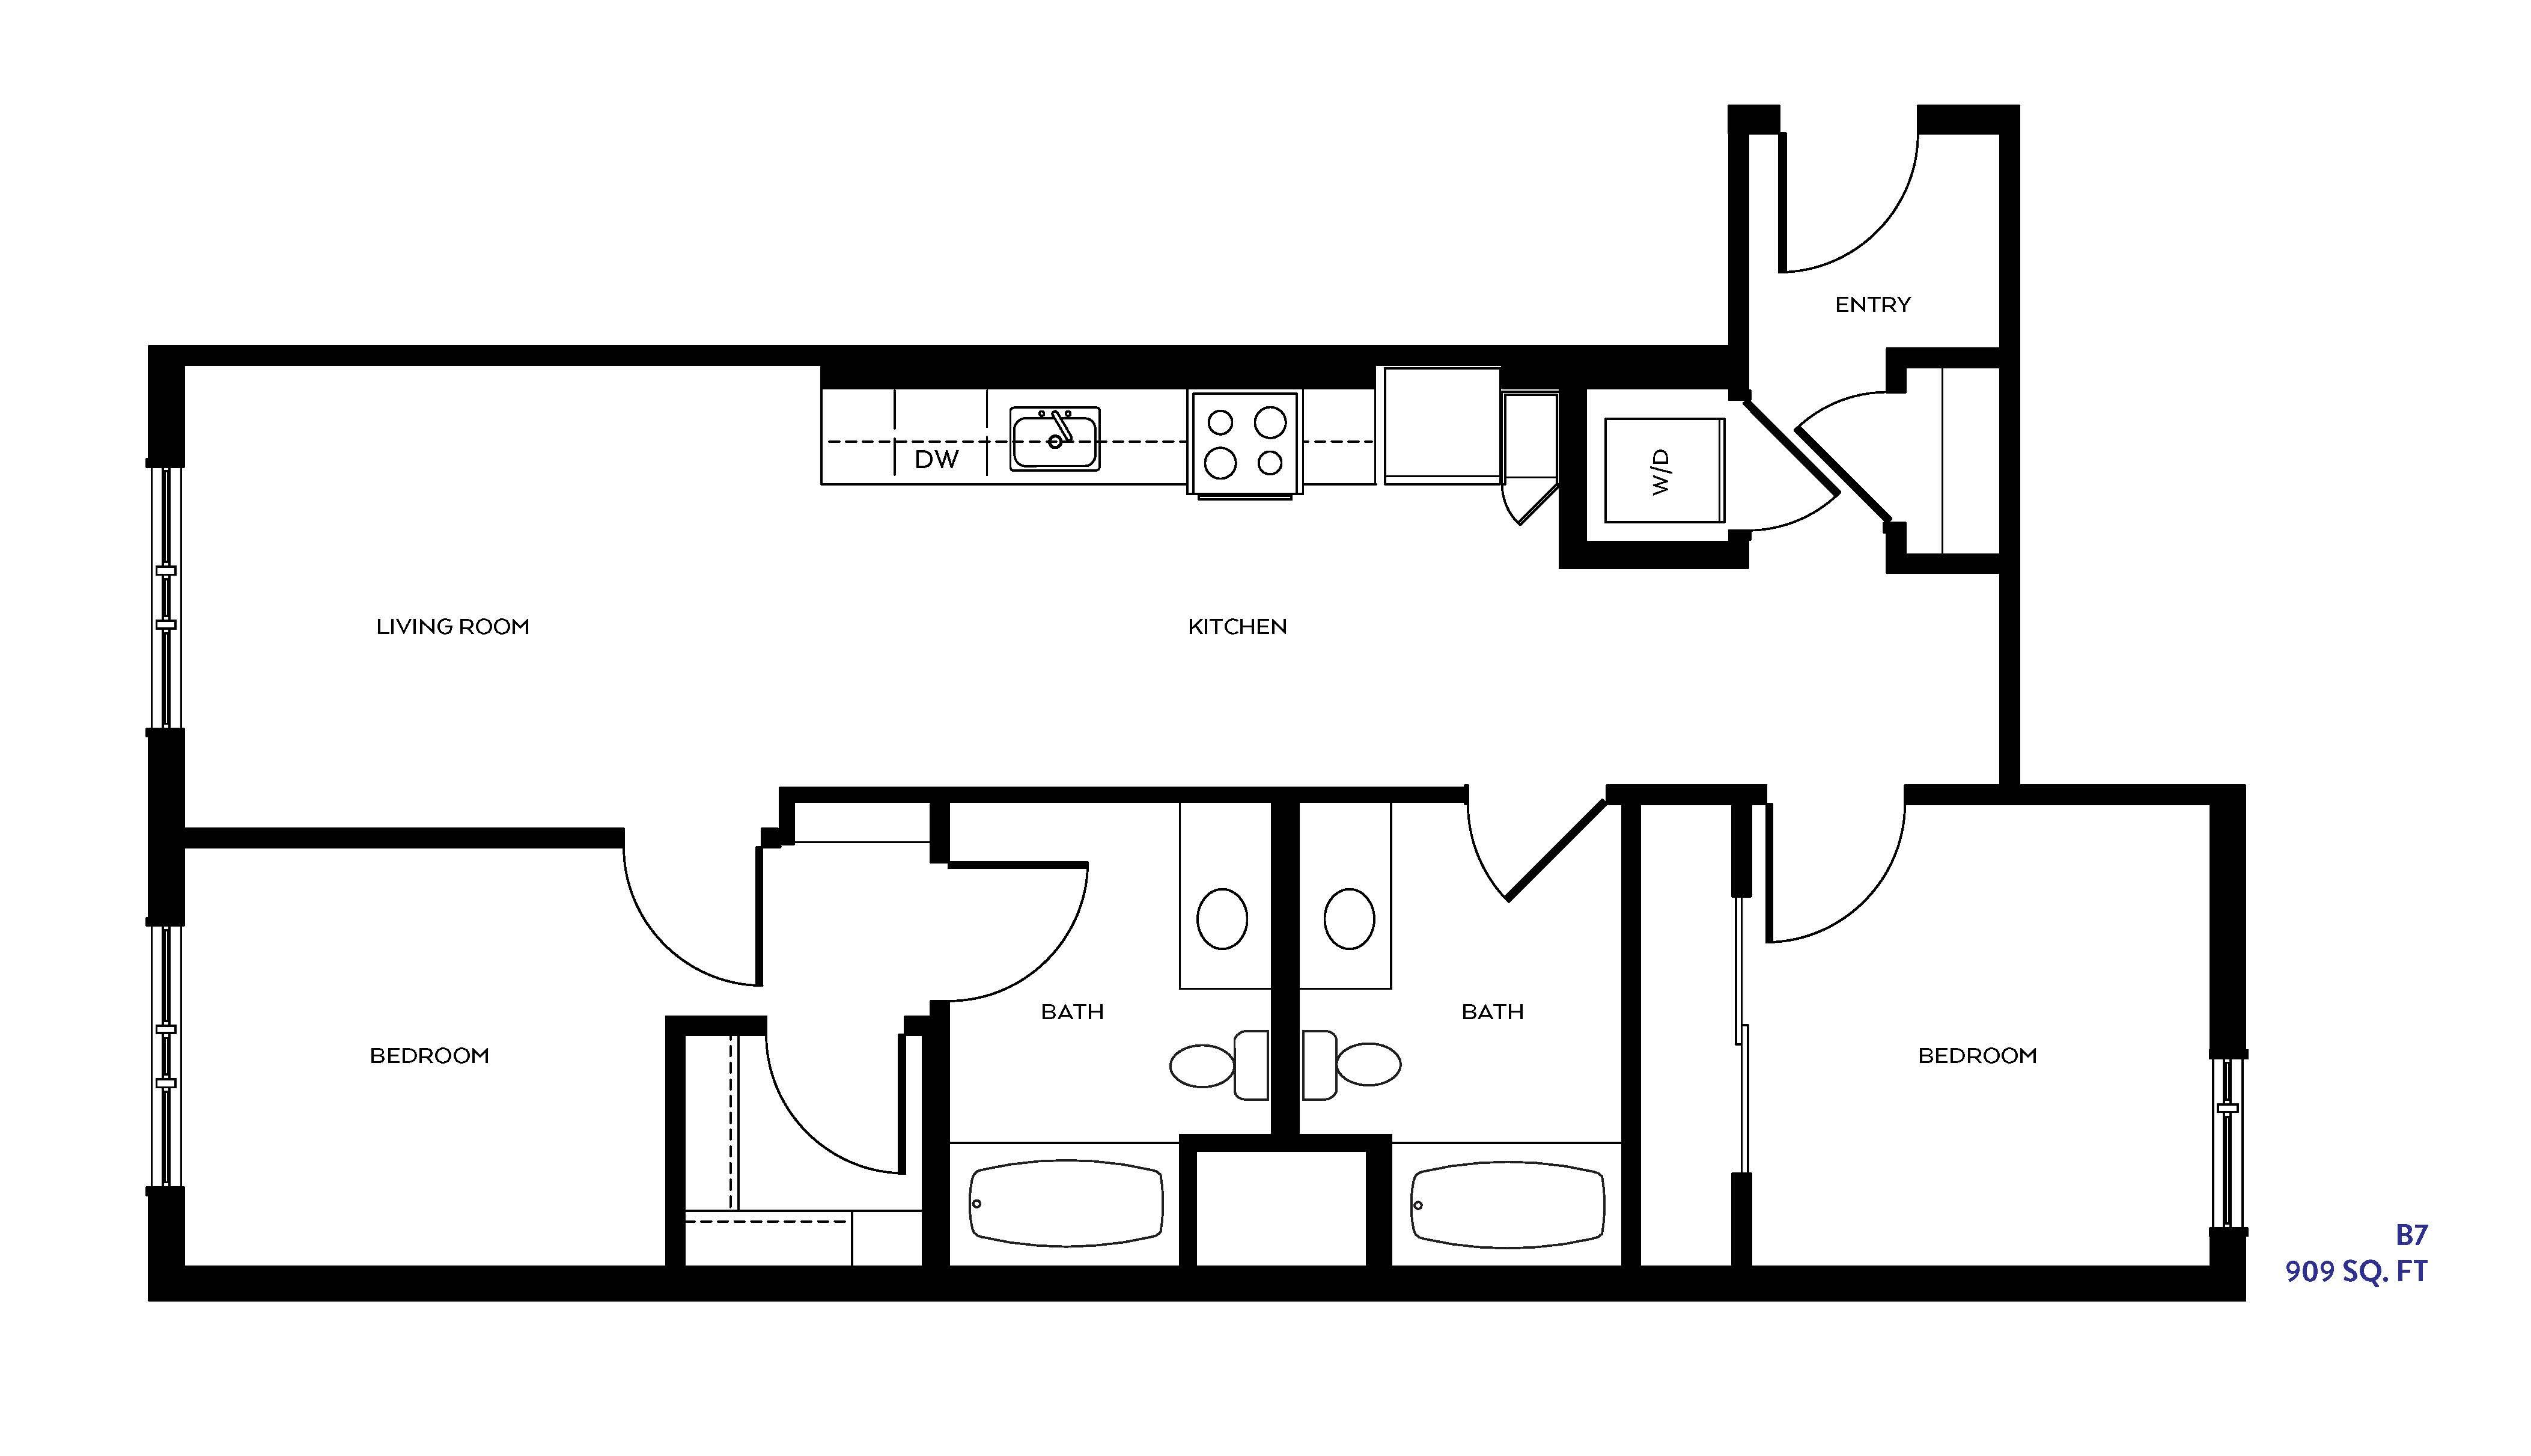 The B7 floor plan